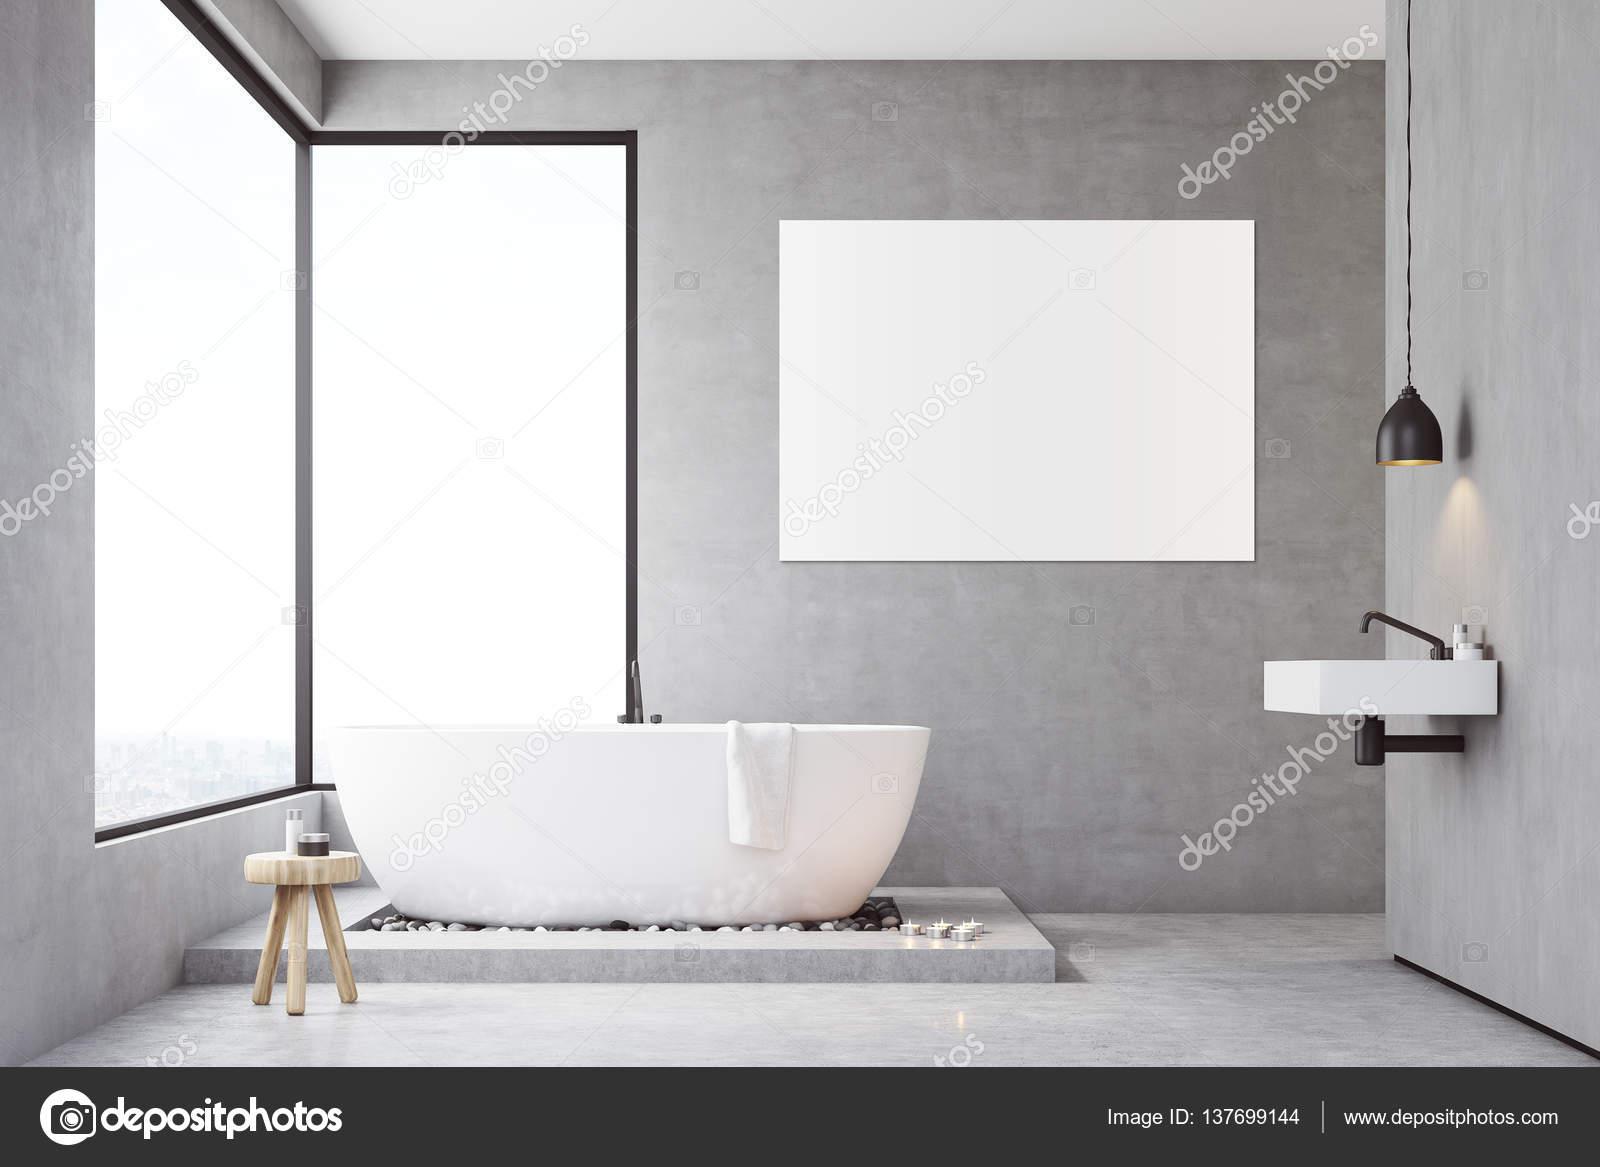 Beton Muur Badkamer : Badkamer met betonnen muren u2014 stockfoto © denisismagilov #137699144